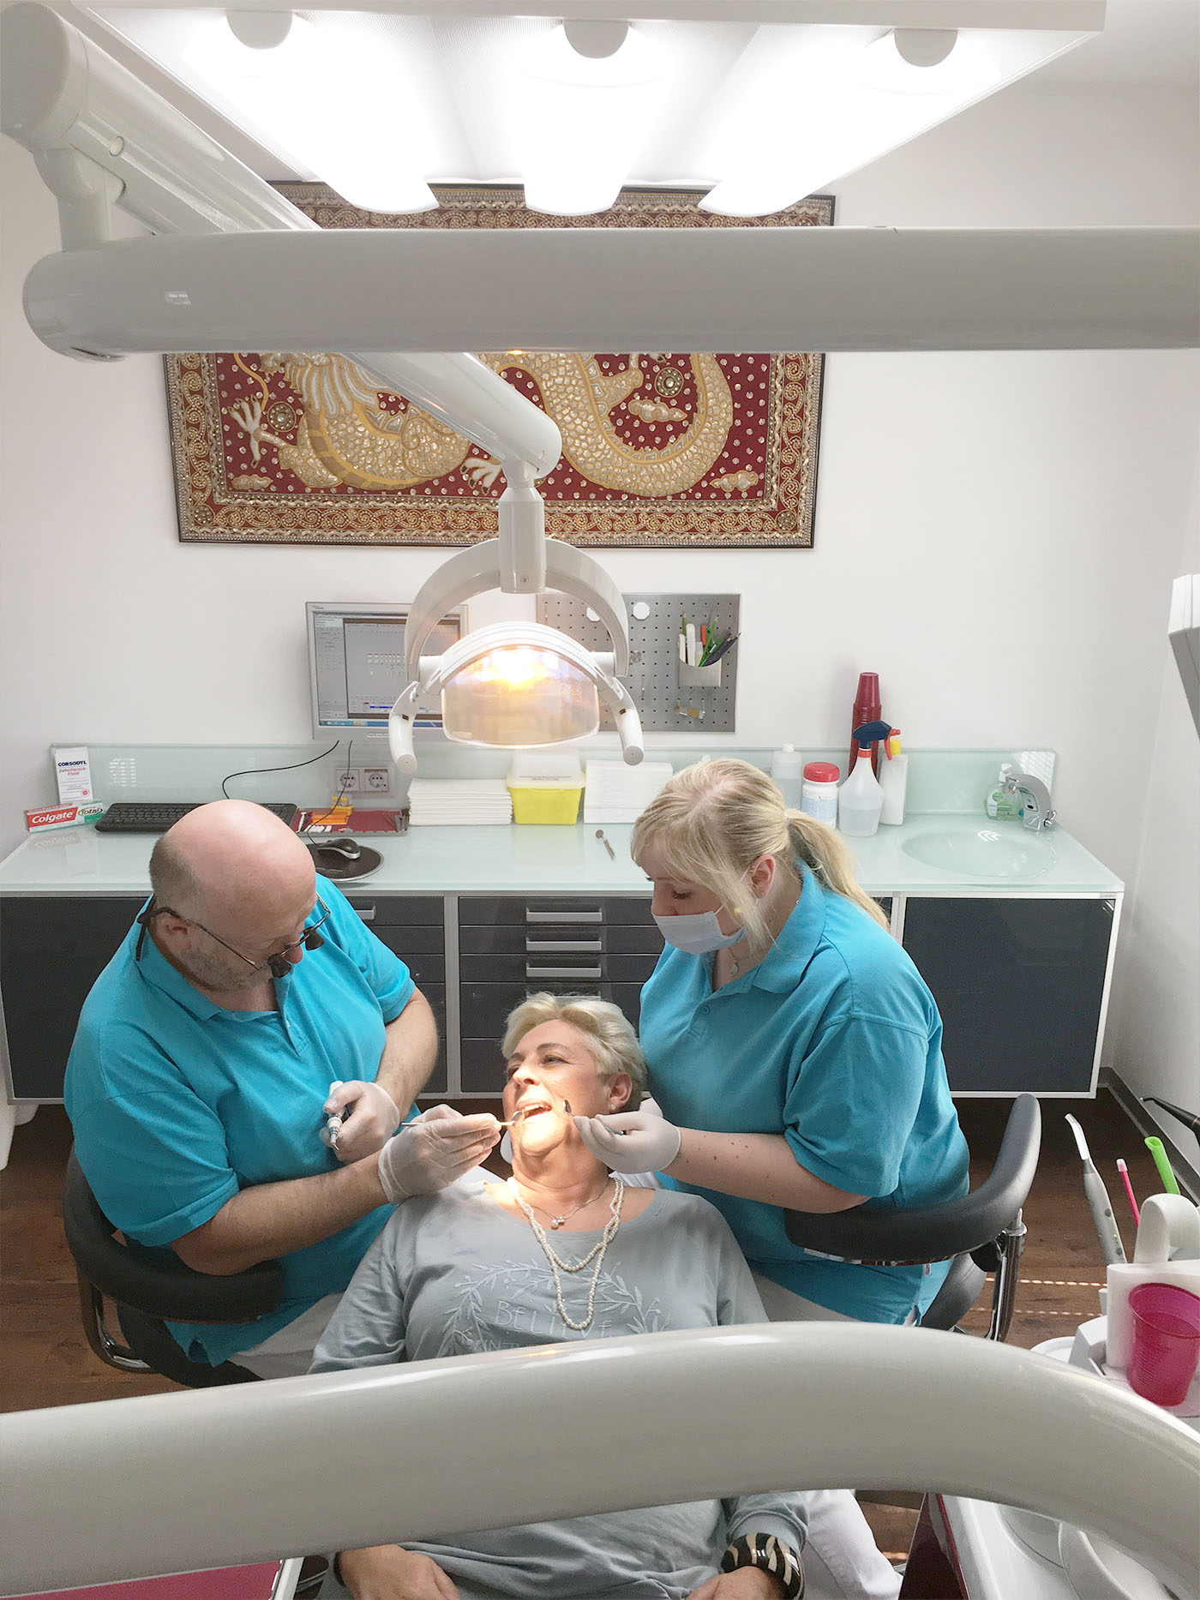 Dr Vockner Zahnarzt in Saalfelden am Steinernen Meer